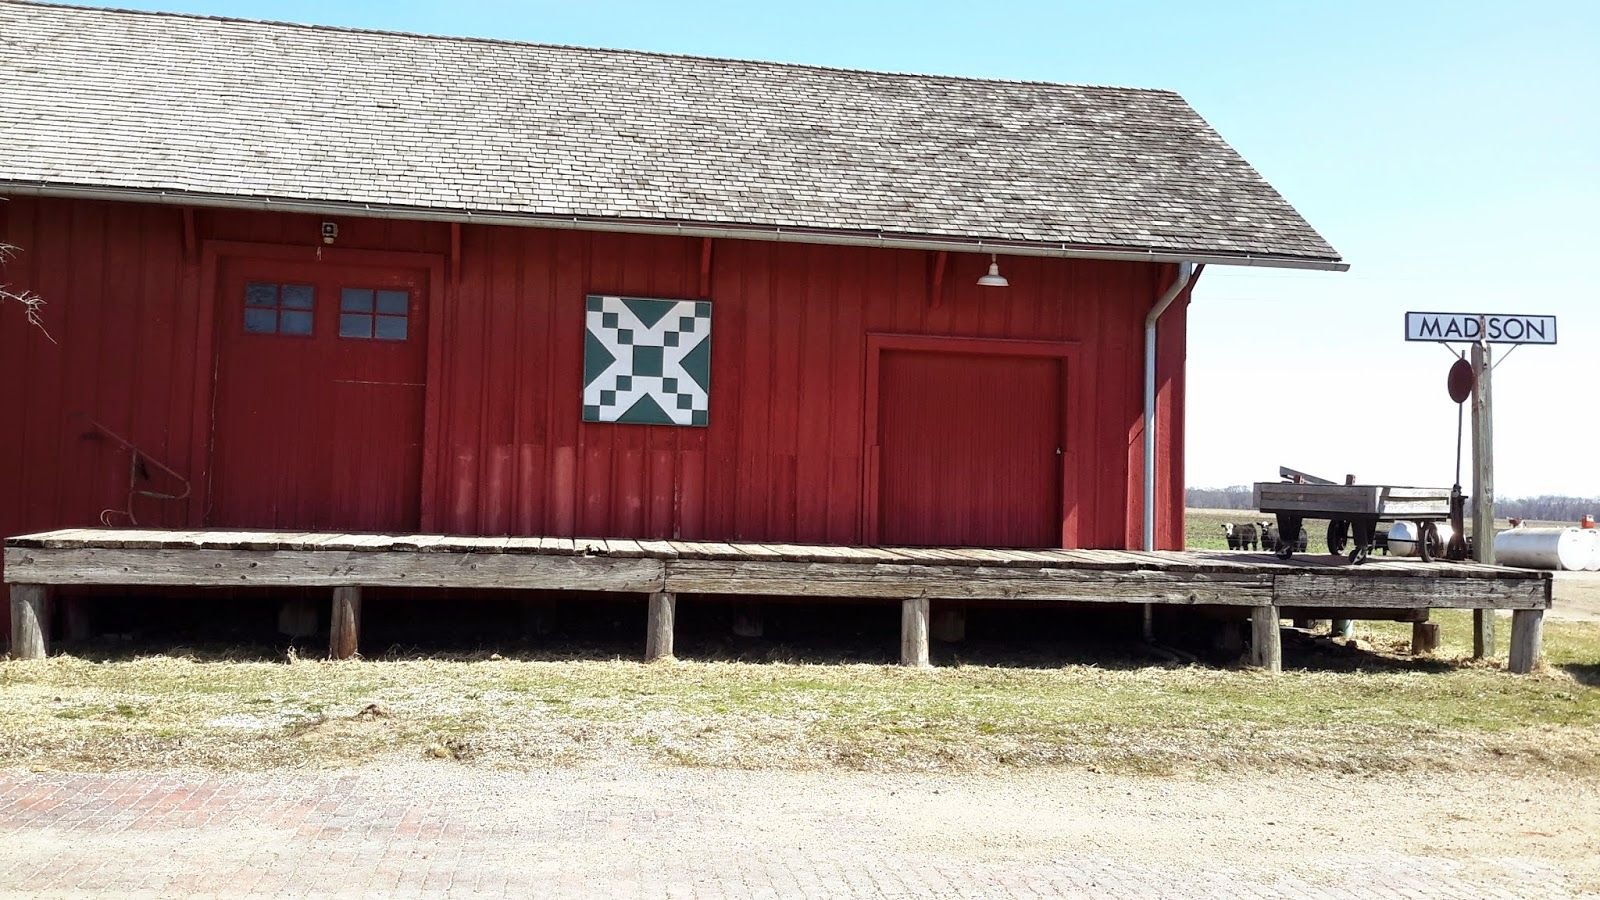 Kansas morris county dwight - Kansas Flint Hills Quilt Trail Greenwood County Railroad Crossing Madison Historical Society